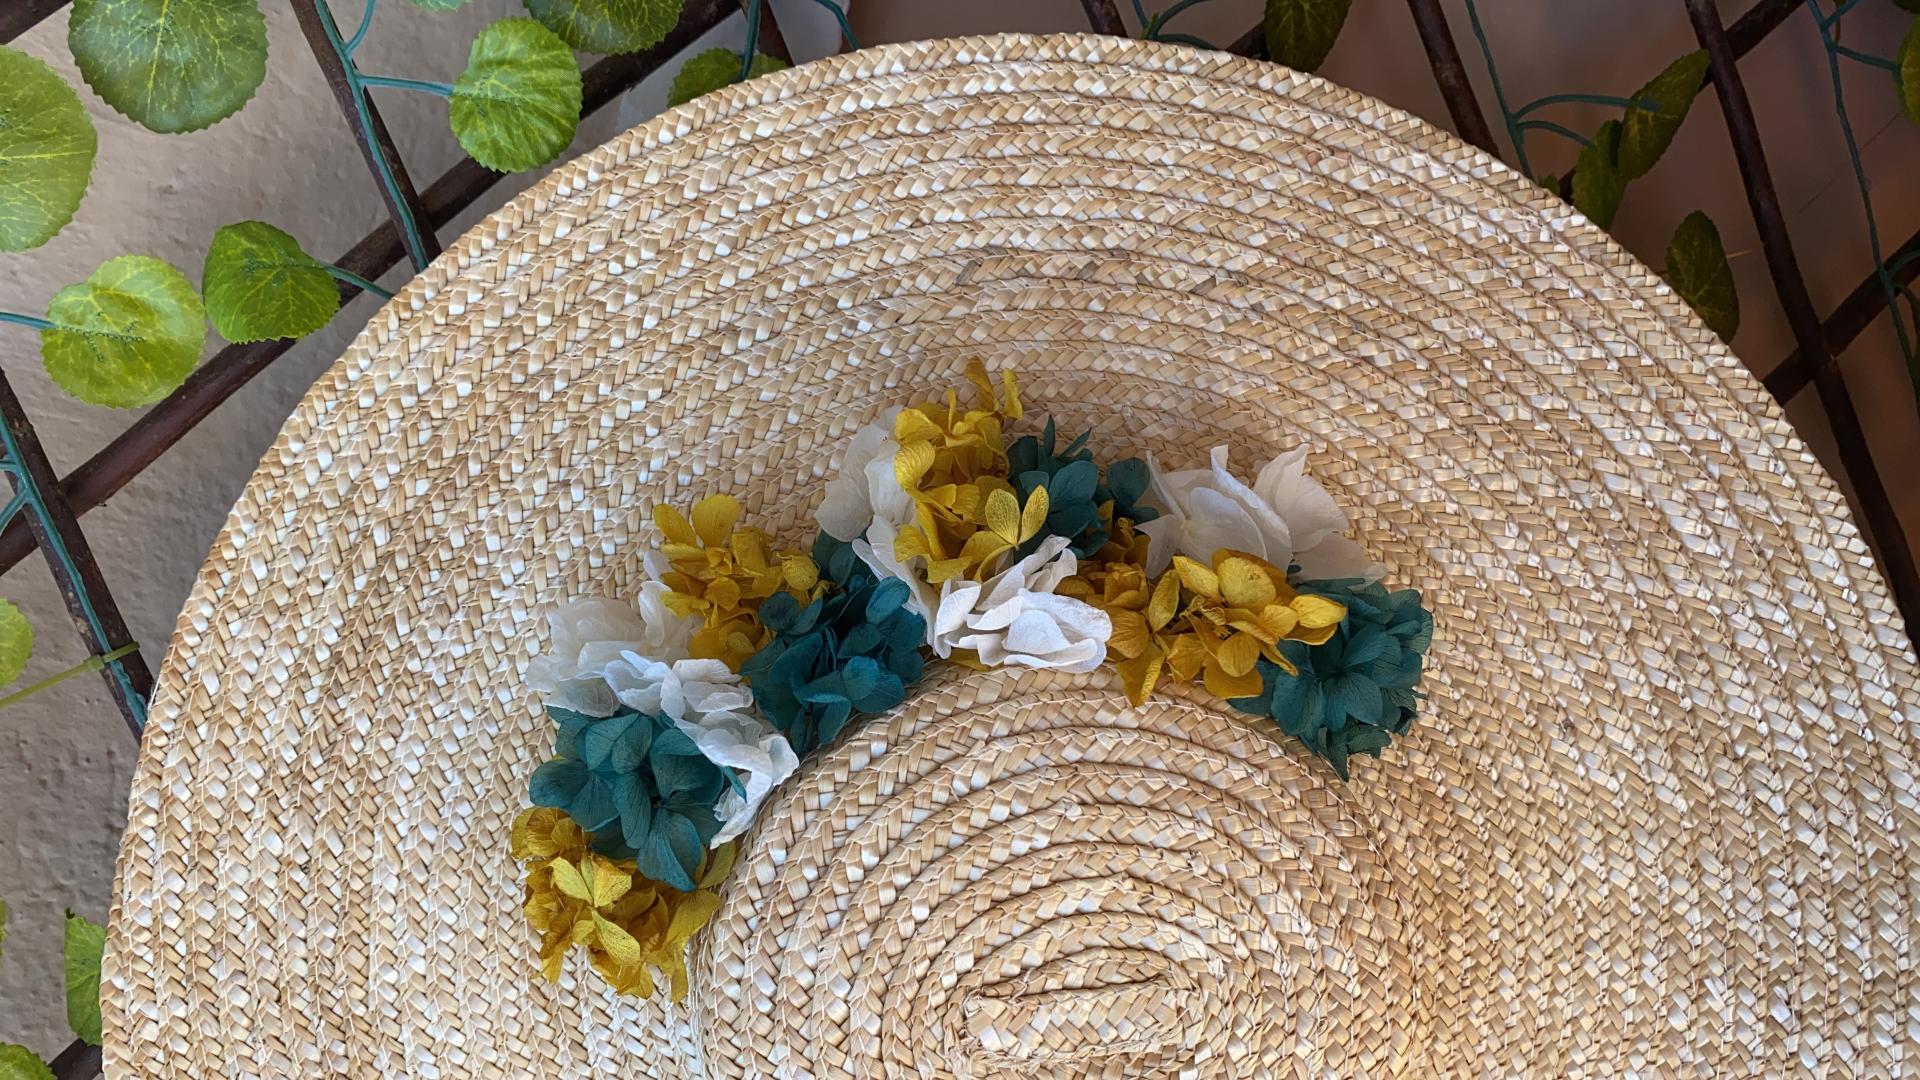 Pamela de flores preservadas